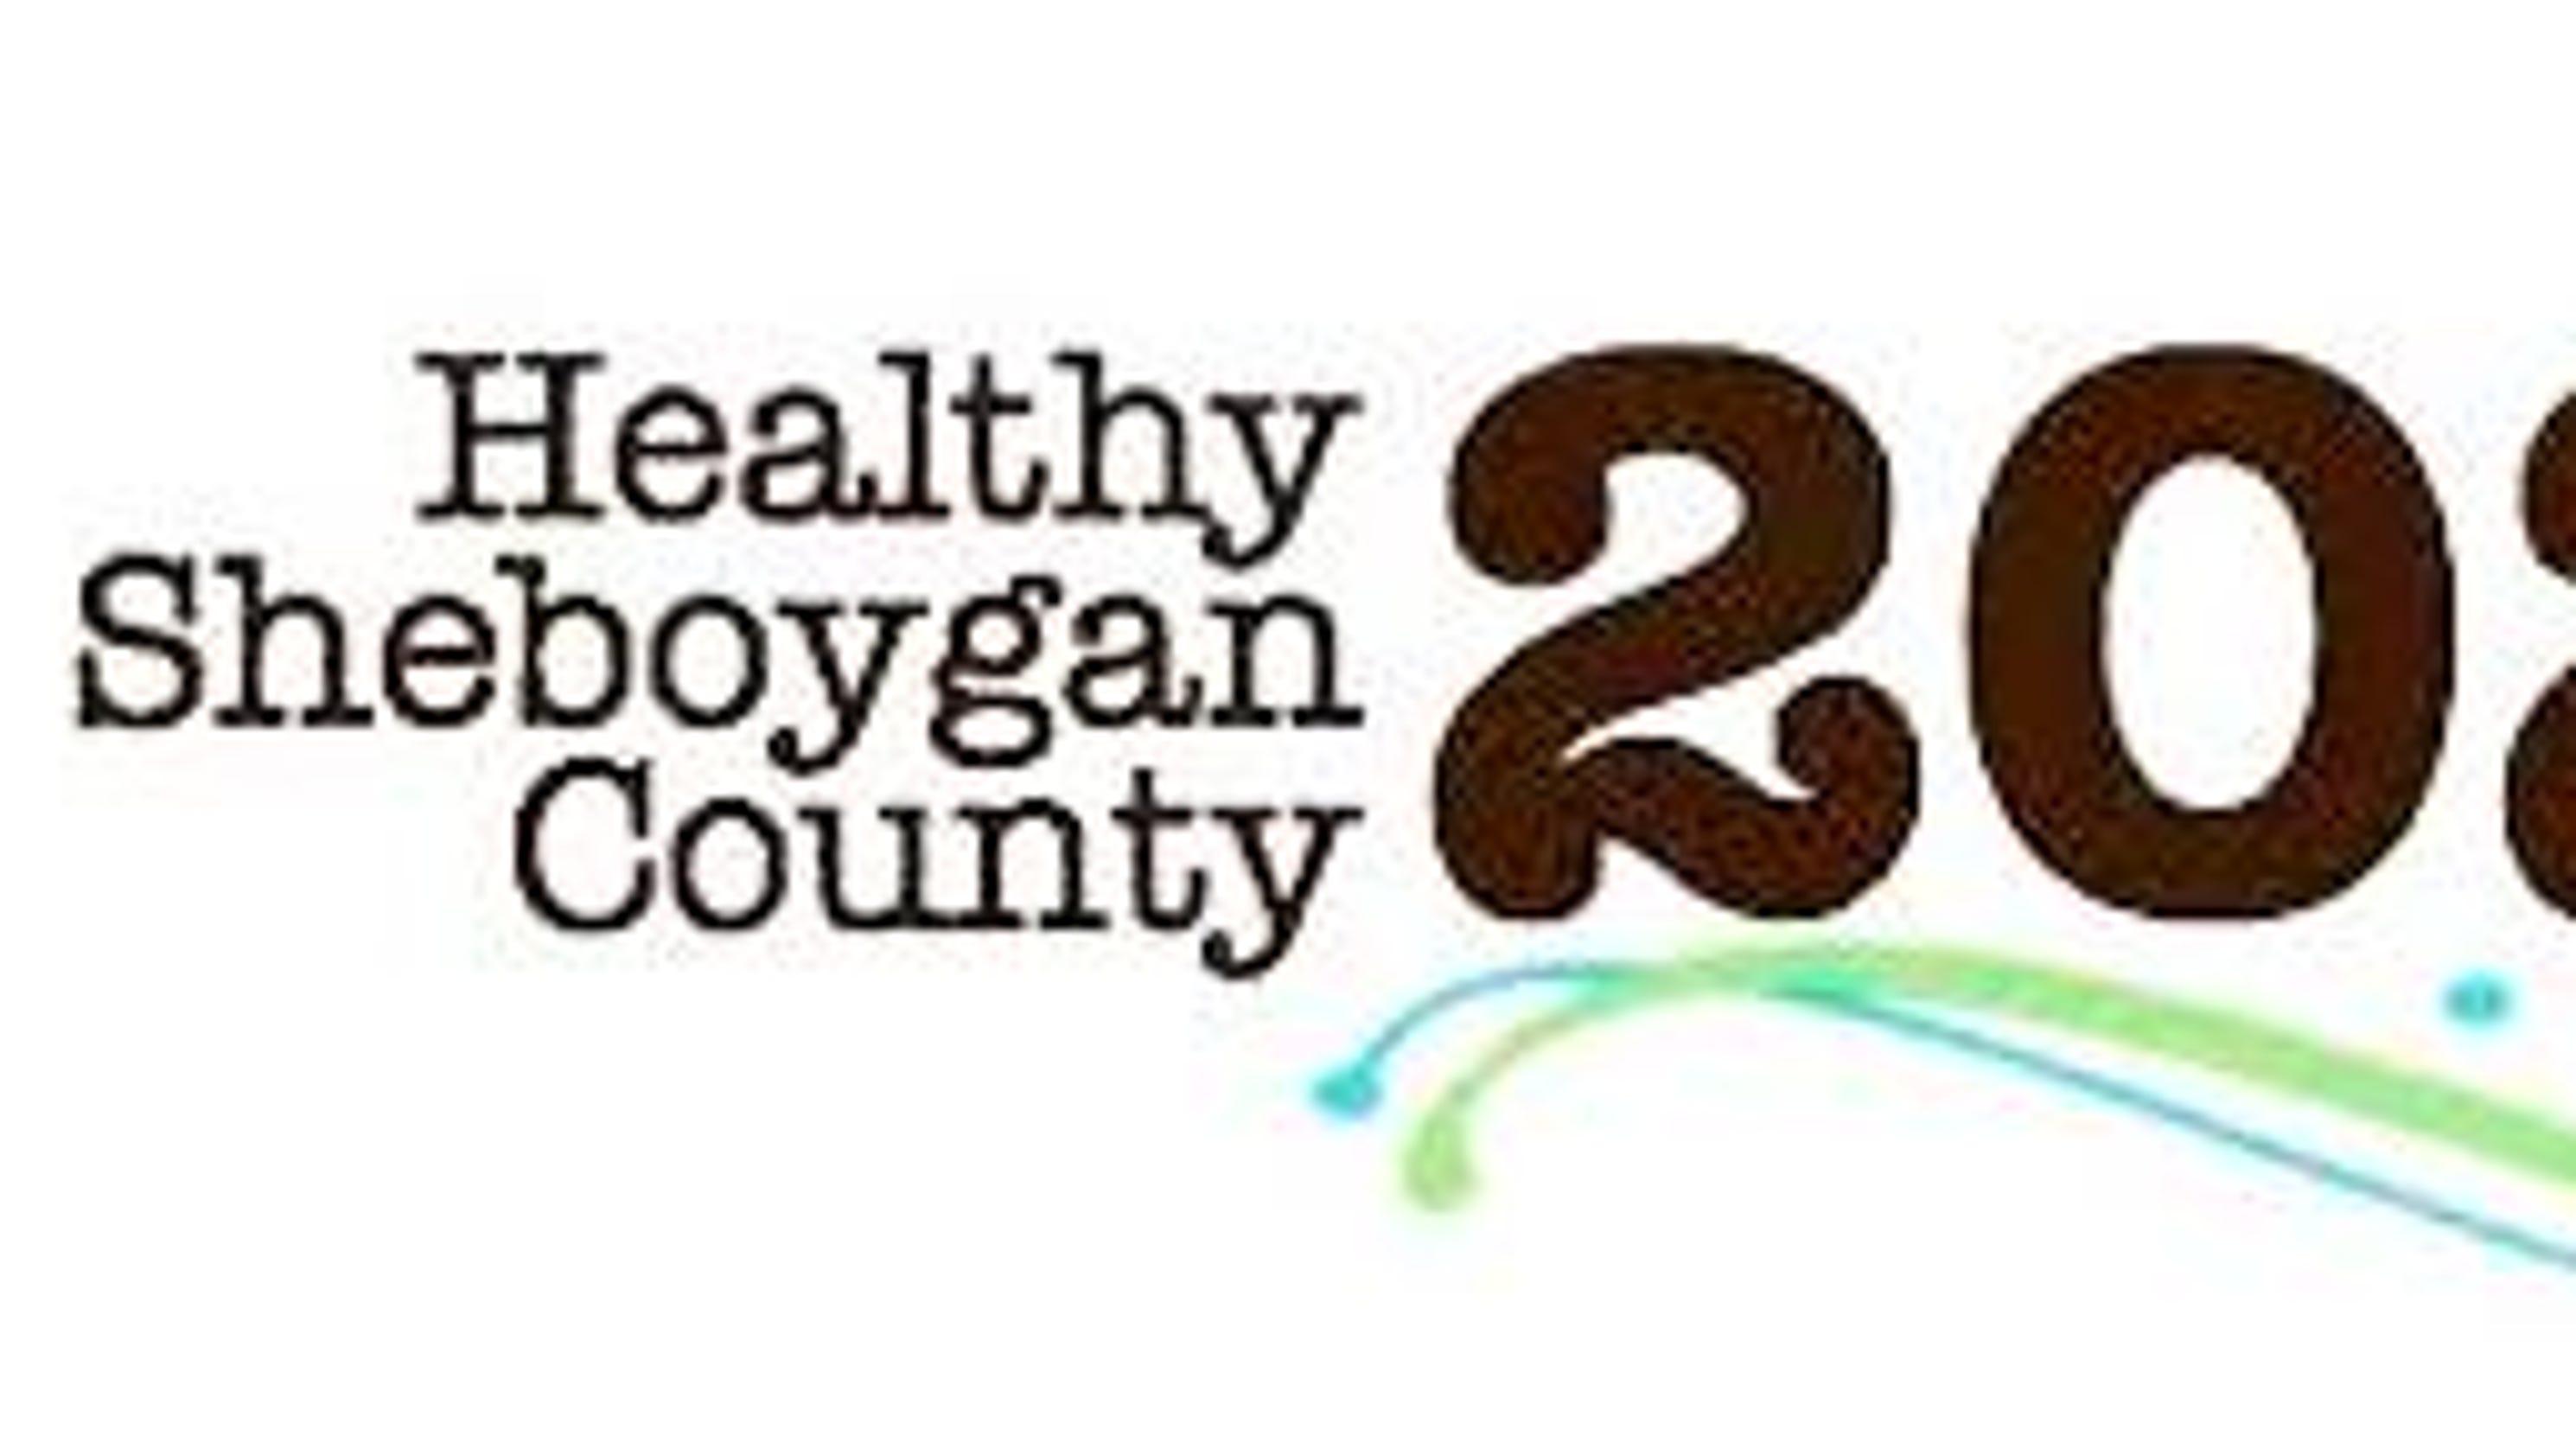 sheboygan county hindu single women Bridgeway & beyond is a 13 bed residential transitional living program for single women with  sheboygan & plymouth farmer's  sheboygan county.